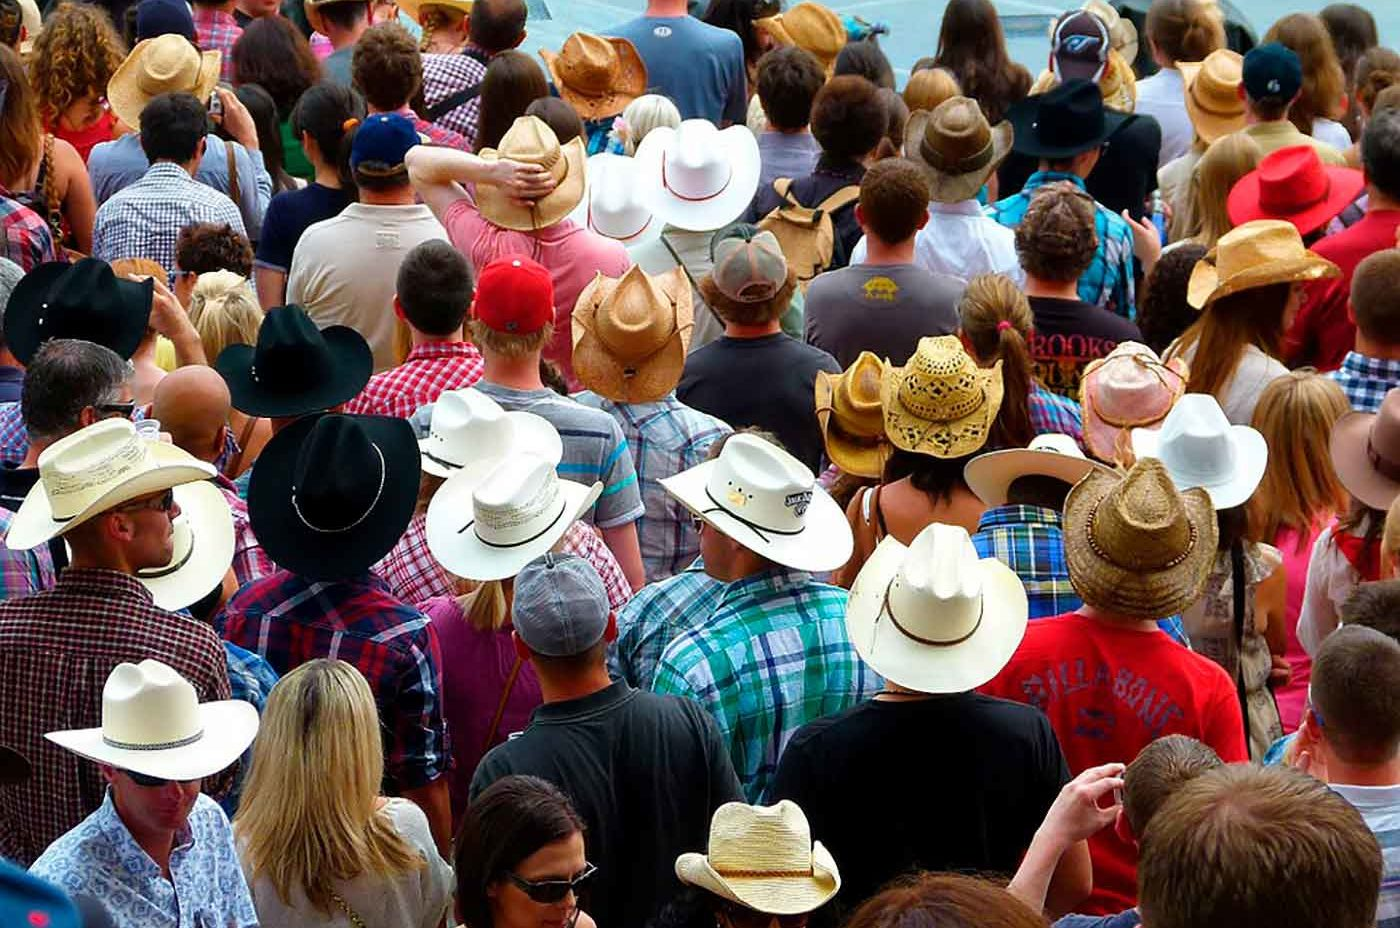 Calgary Stampede crowd